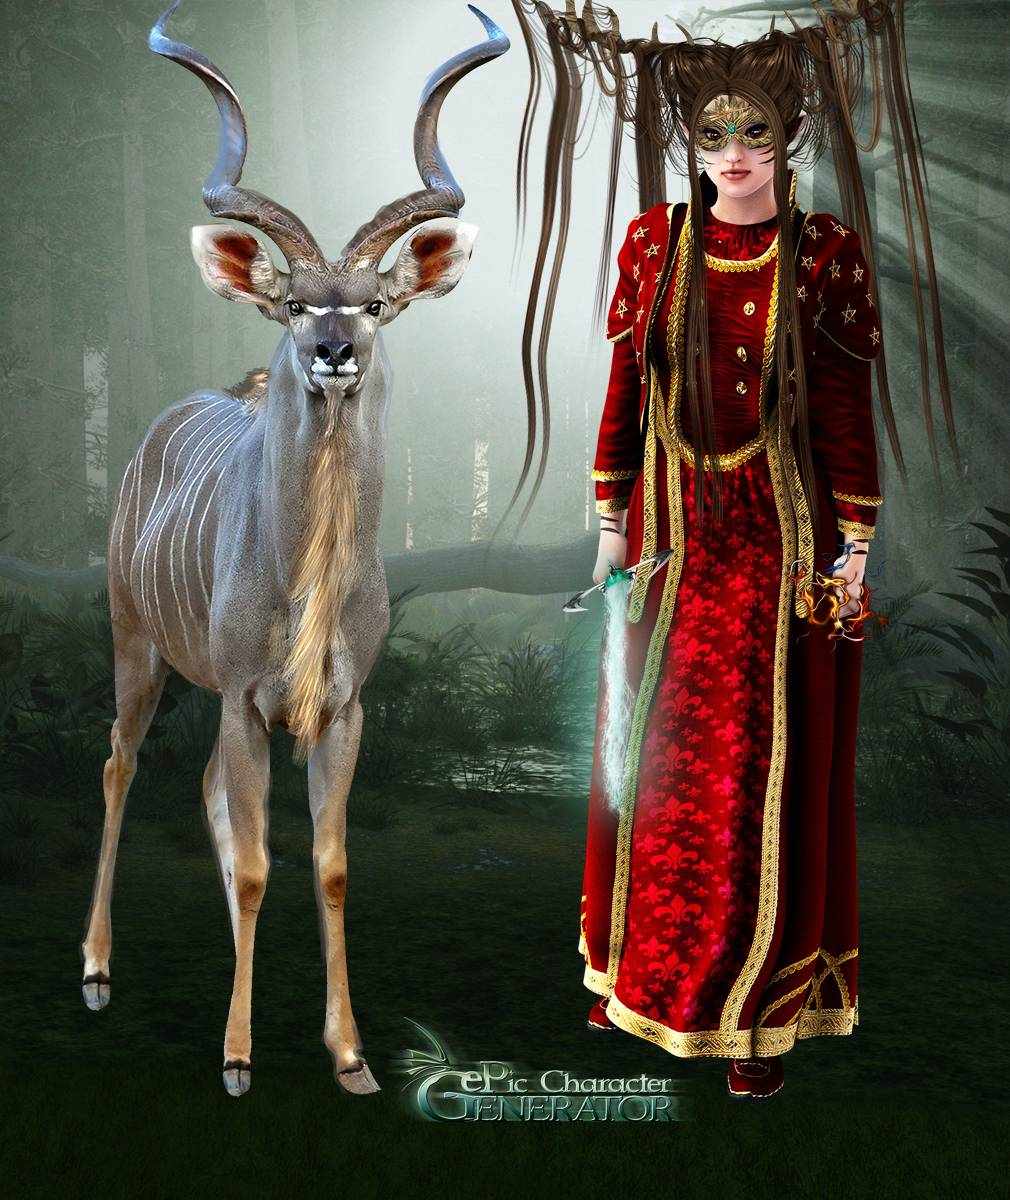 ePic Character Generator Season 2 Fantasy Bestiary Screenshot 12